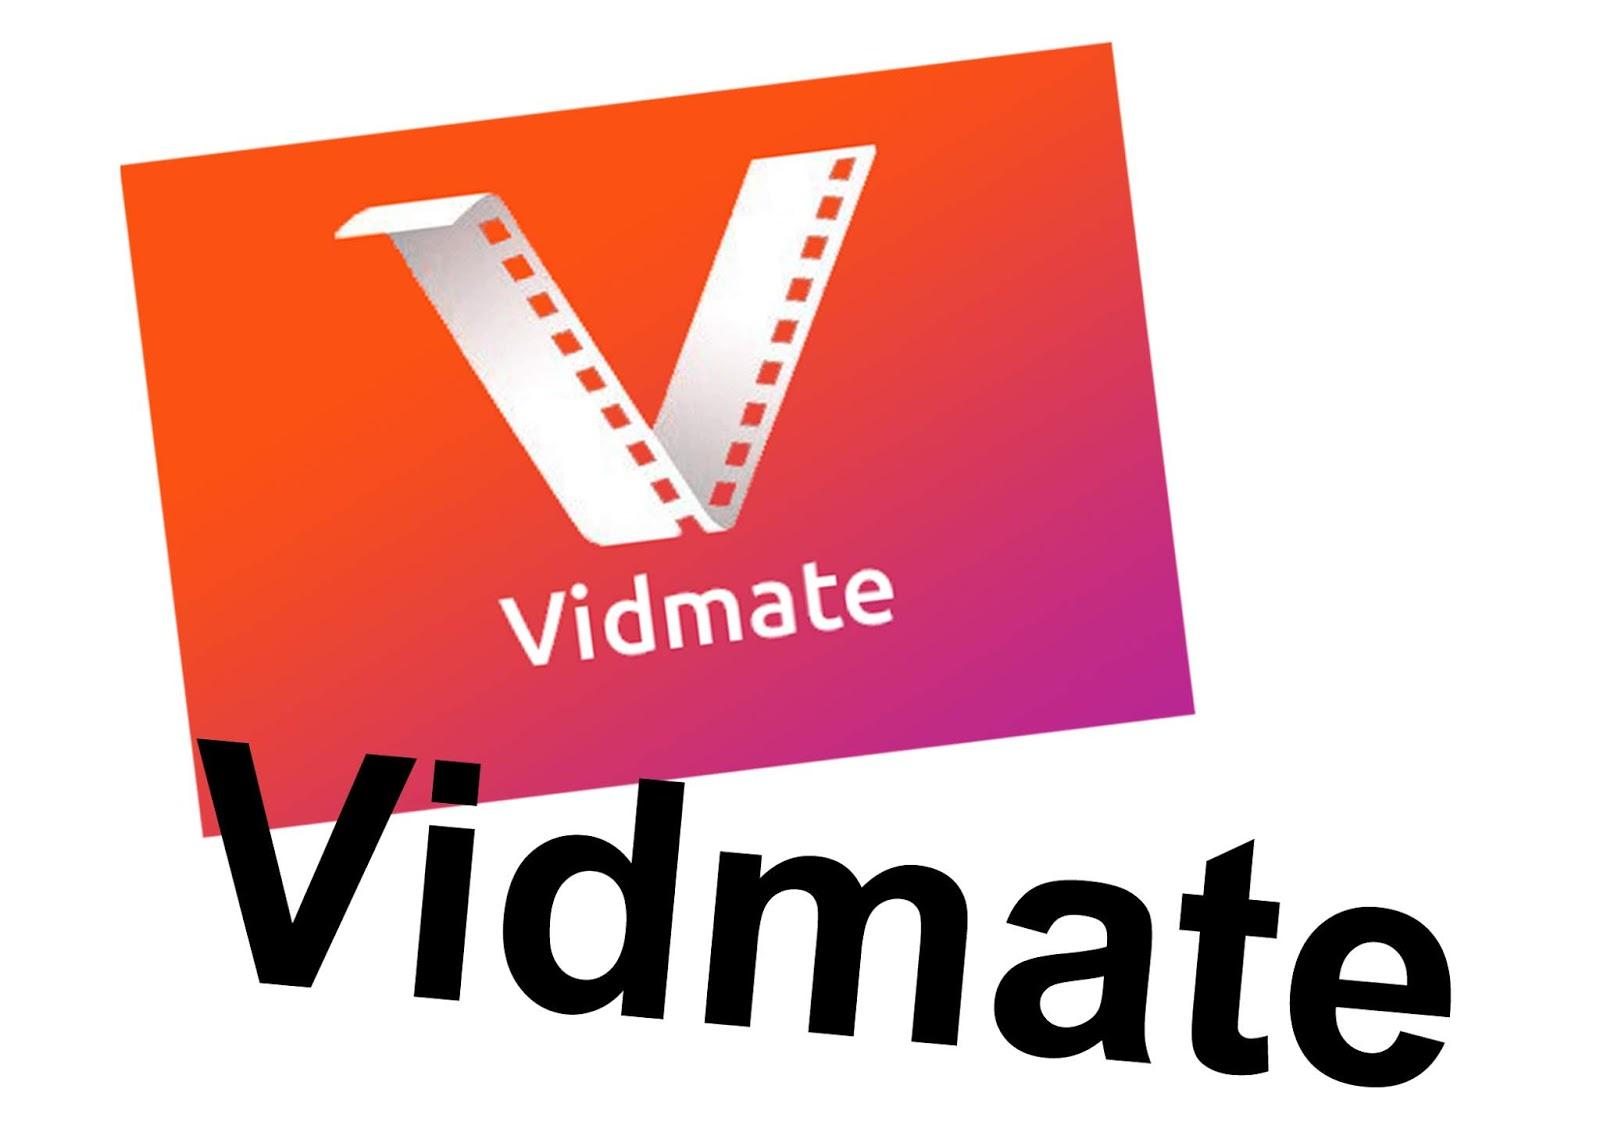 VidMate for Android - APK Download 2019 - Sohail Amir